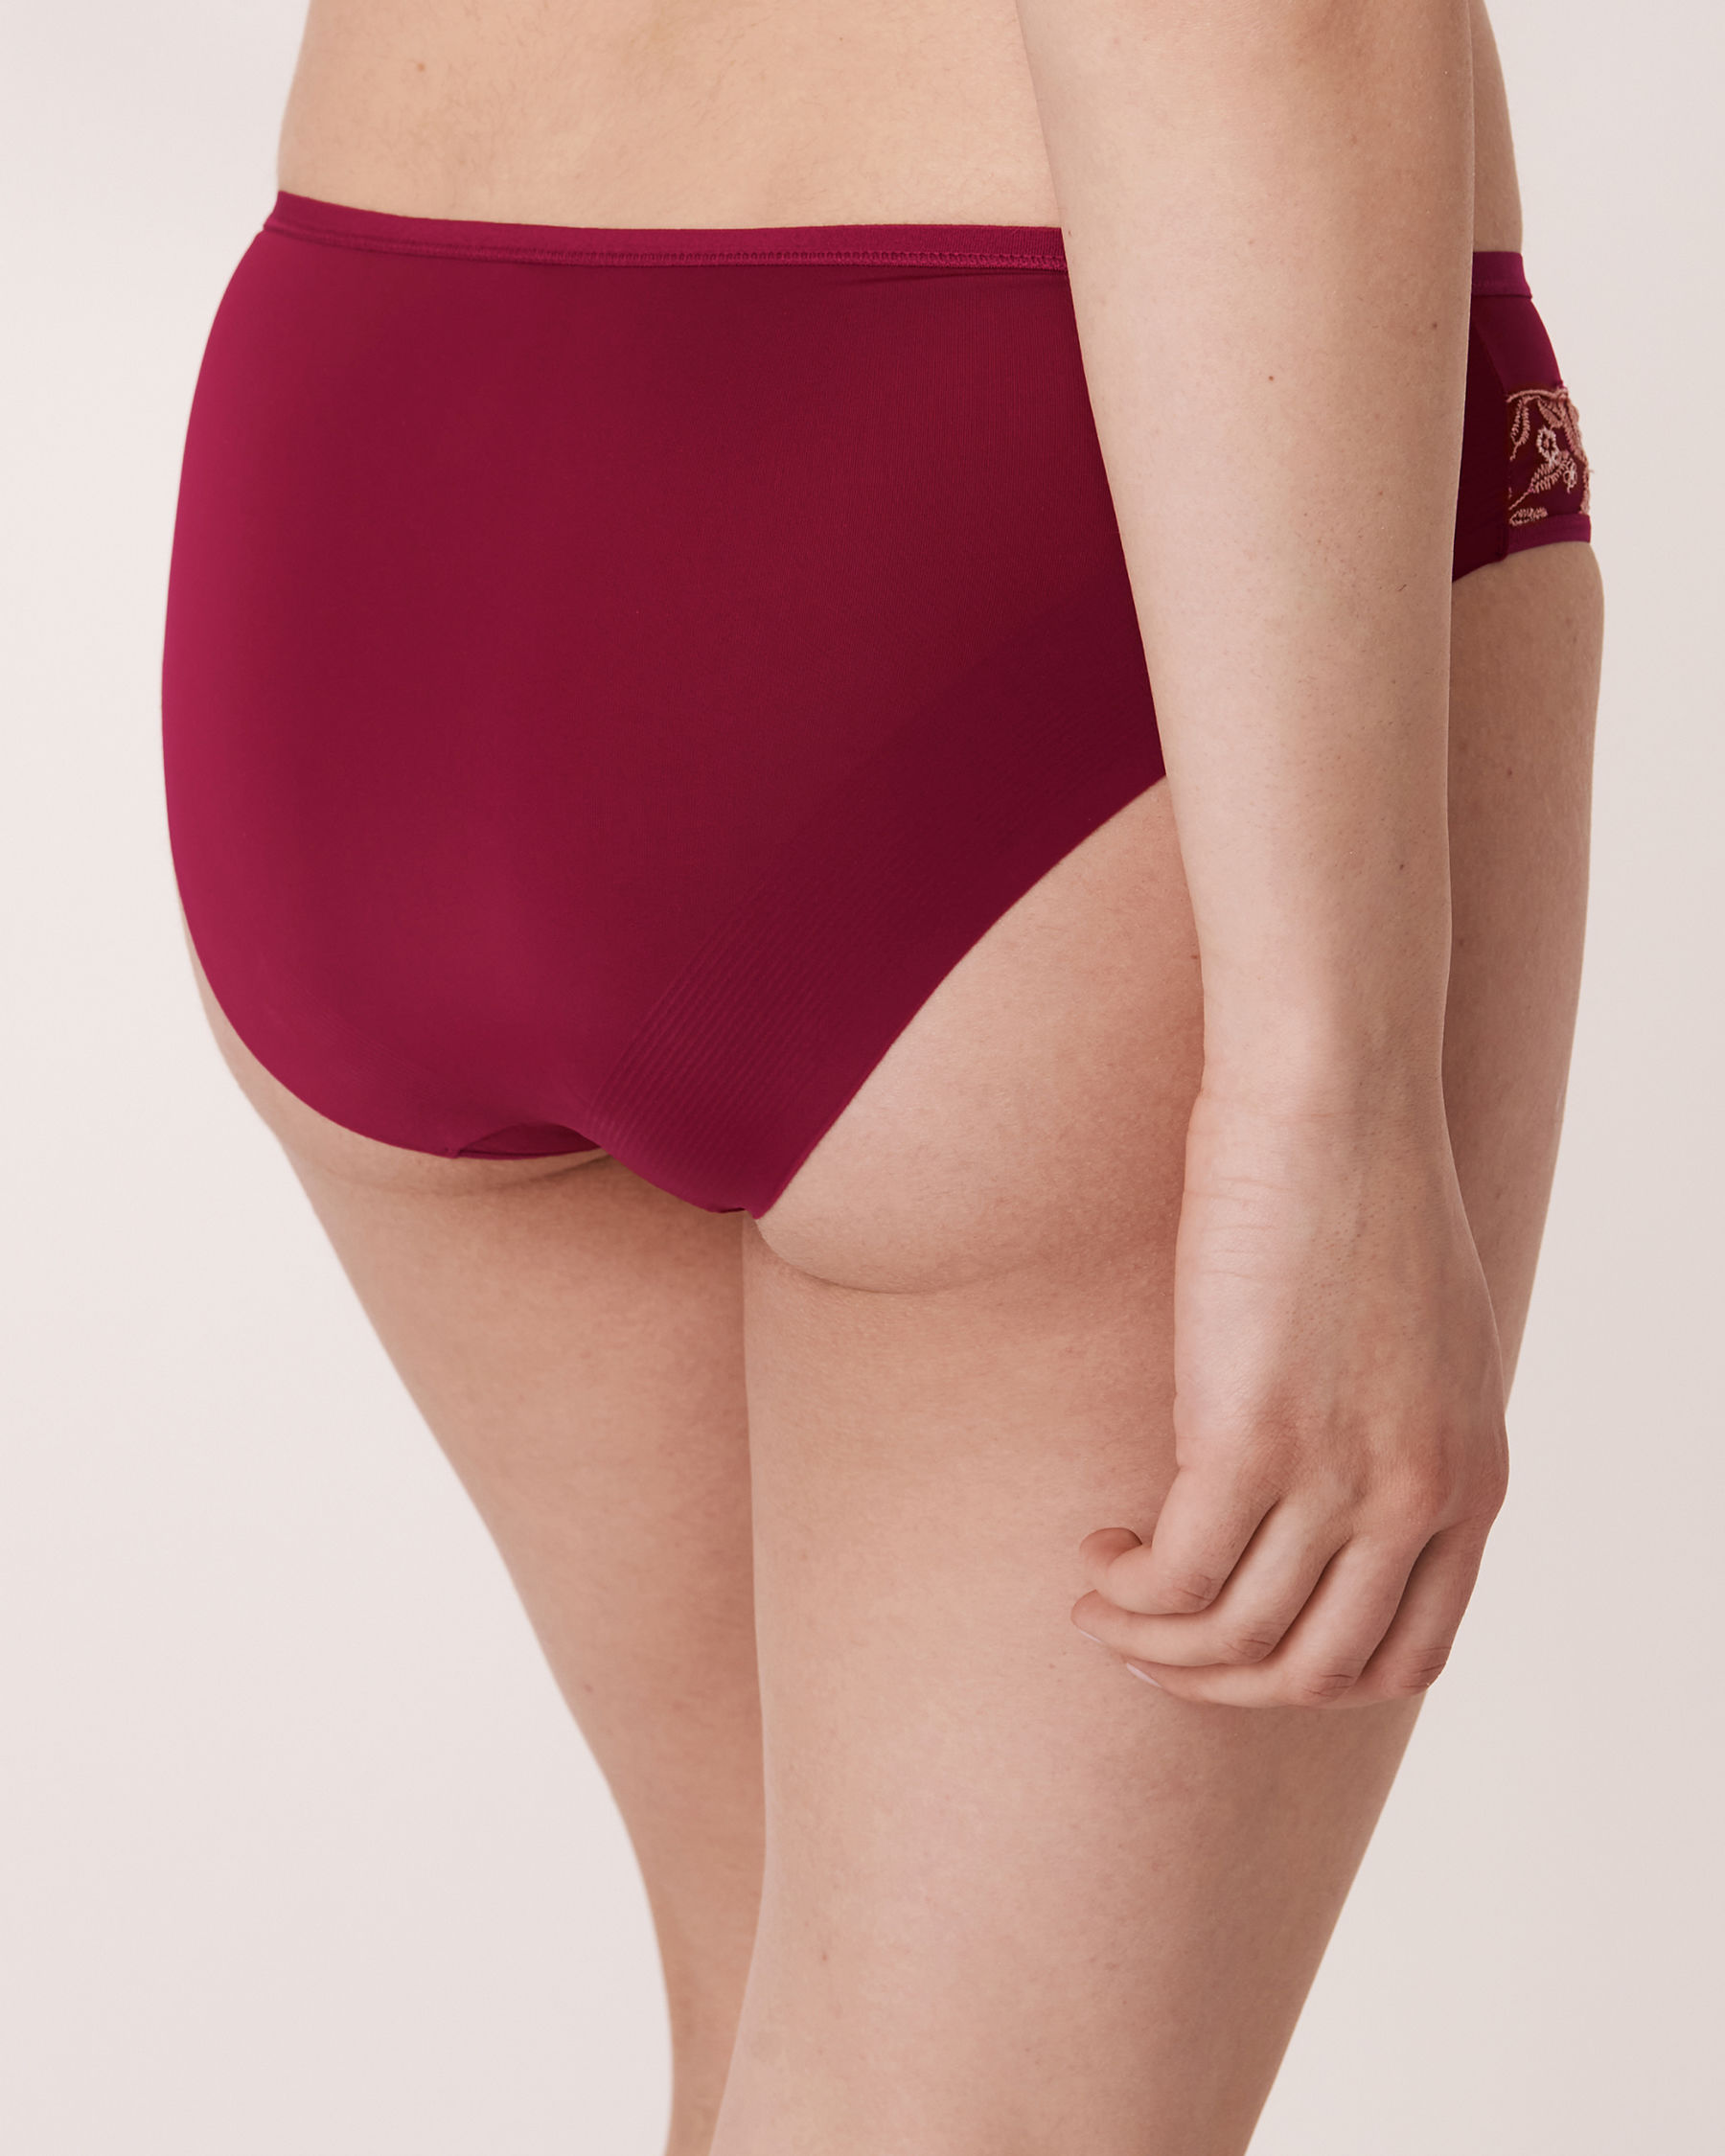 LA VIE EN ROSE Culotte bikini Fleur brodée 20300034 - Voir2